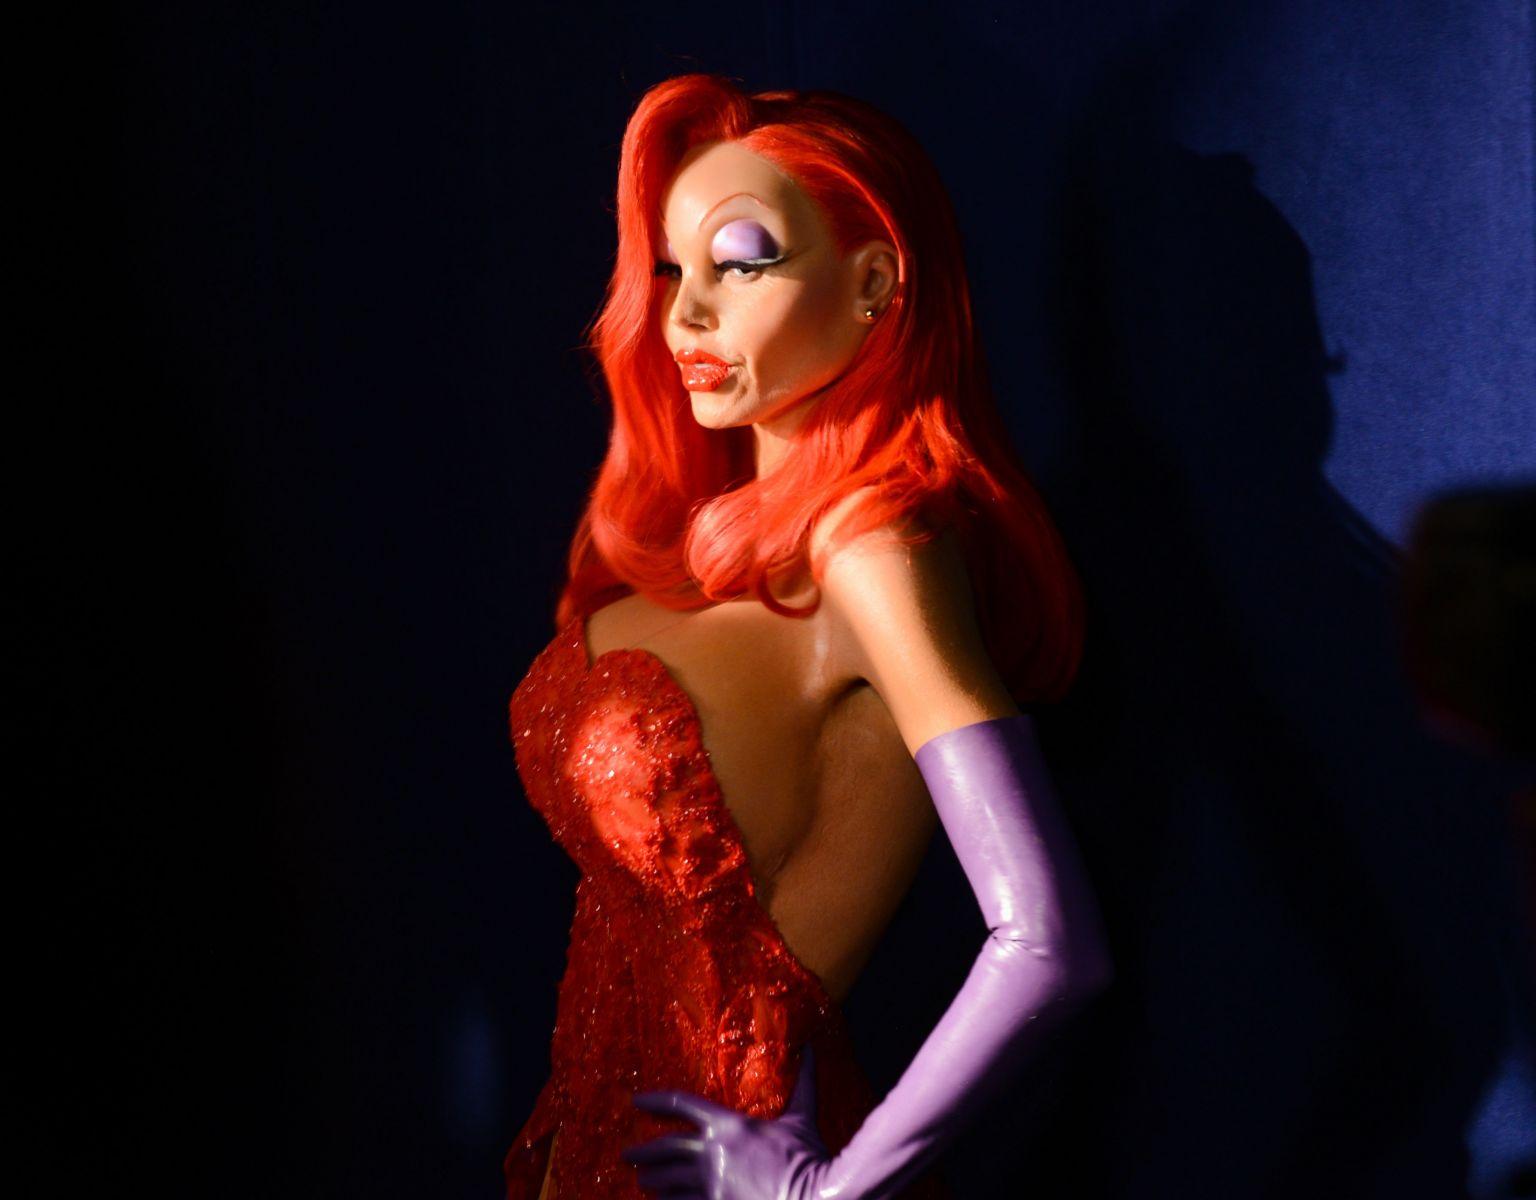 10 самых ярких костюмов звезд на Хэллоуин (ФОТО)